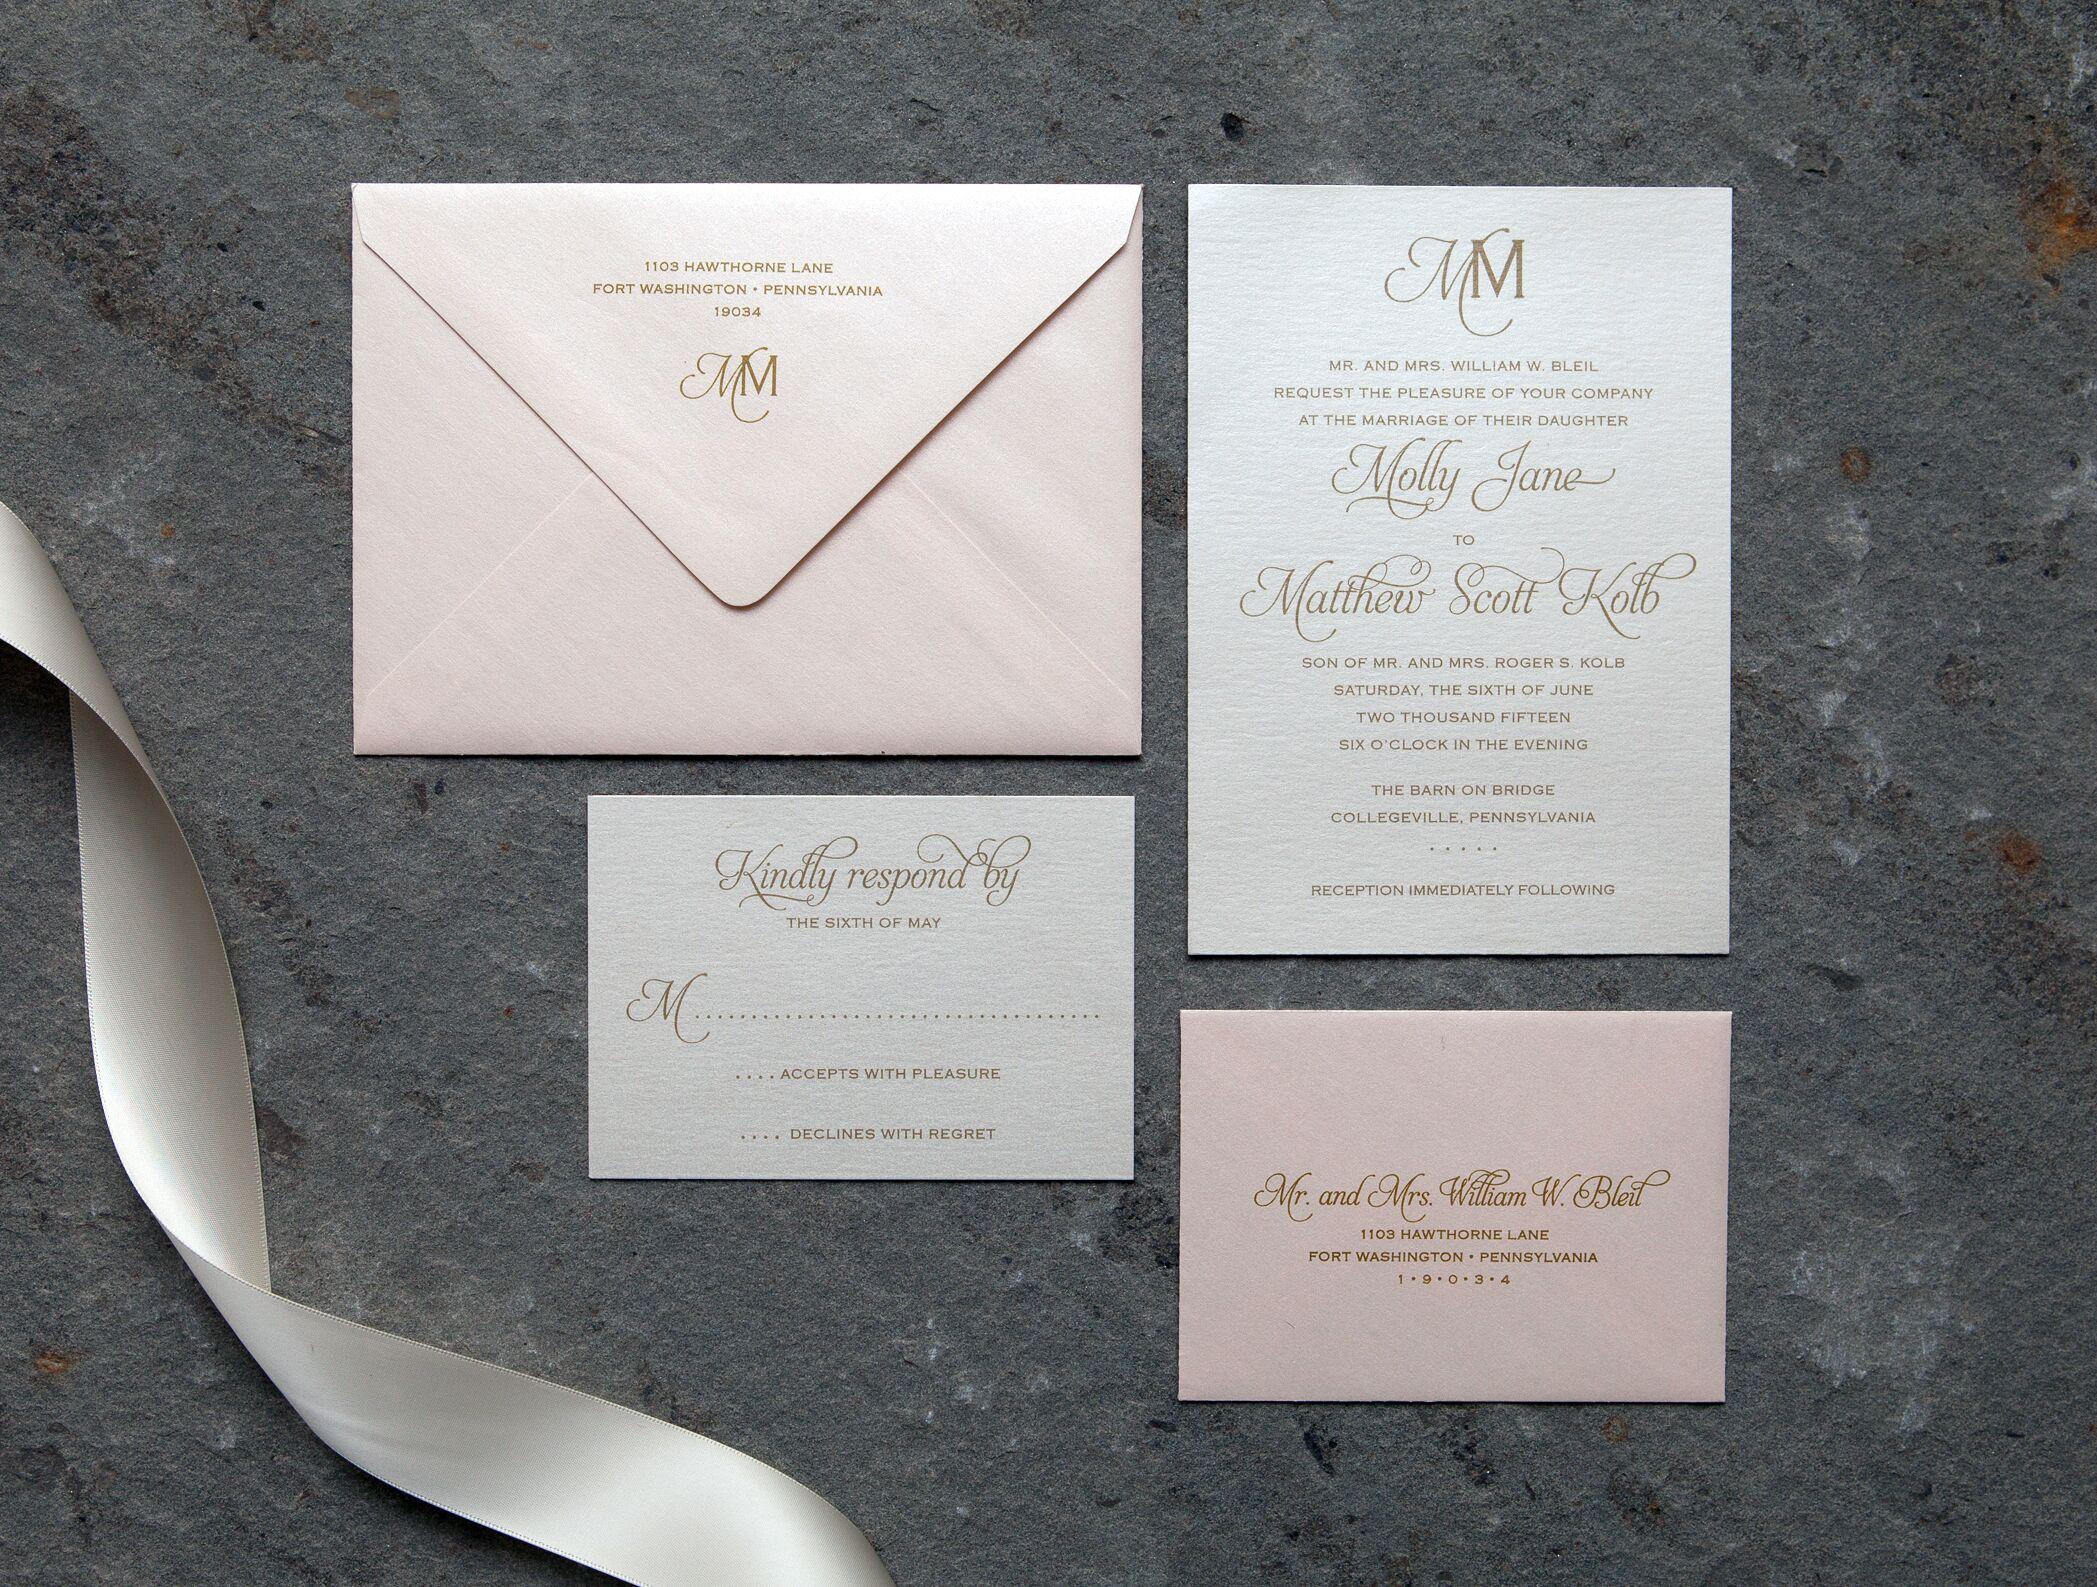 Invitations + Paper in Philadelphia, PA - The Knot